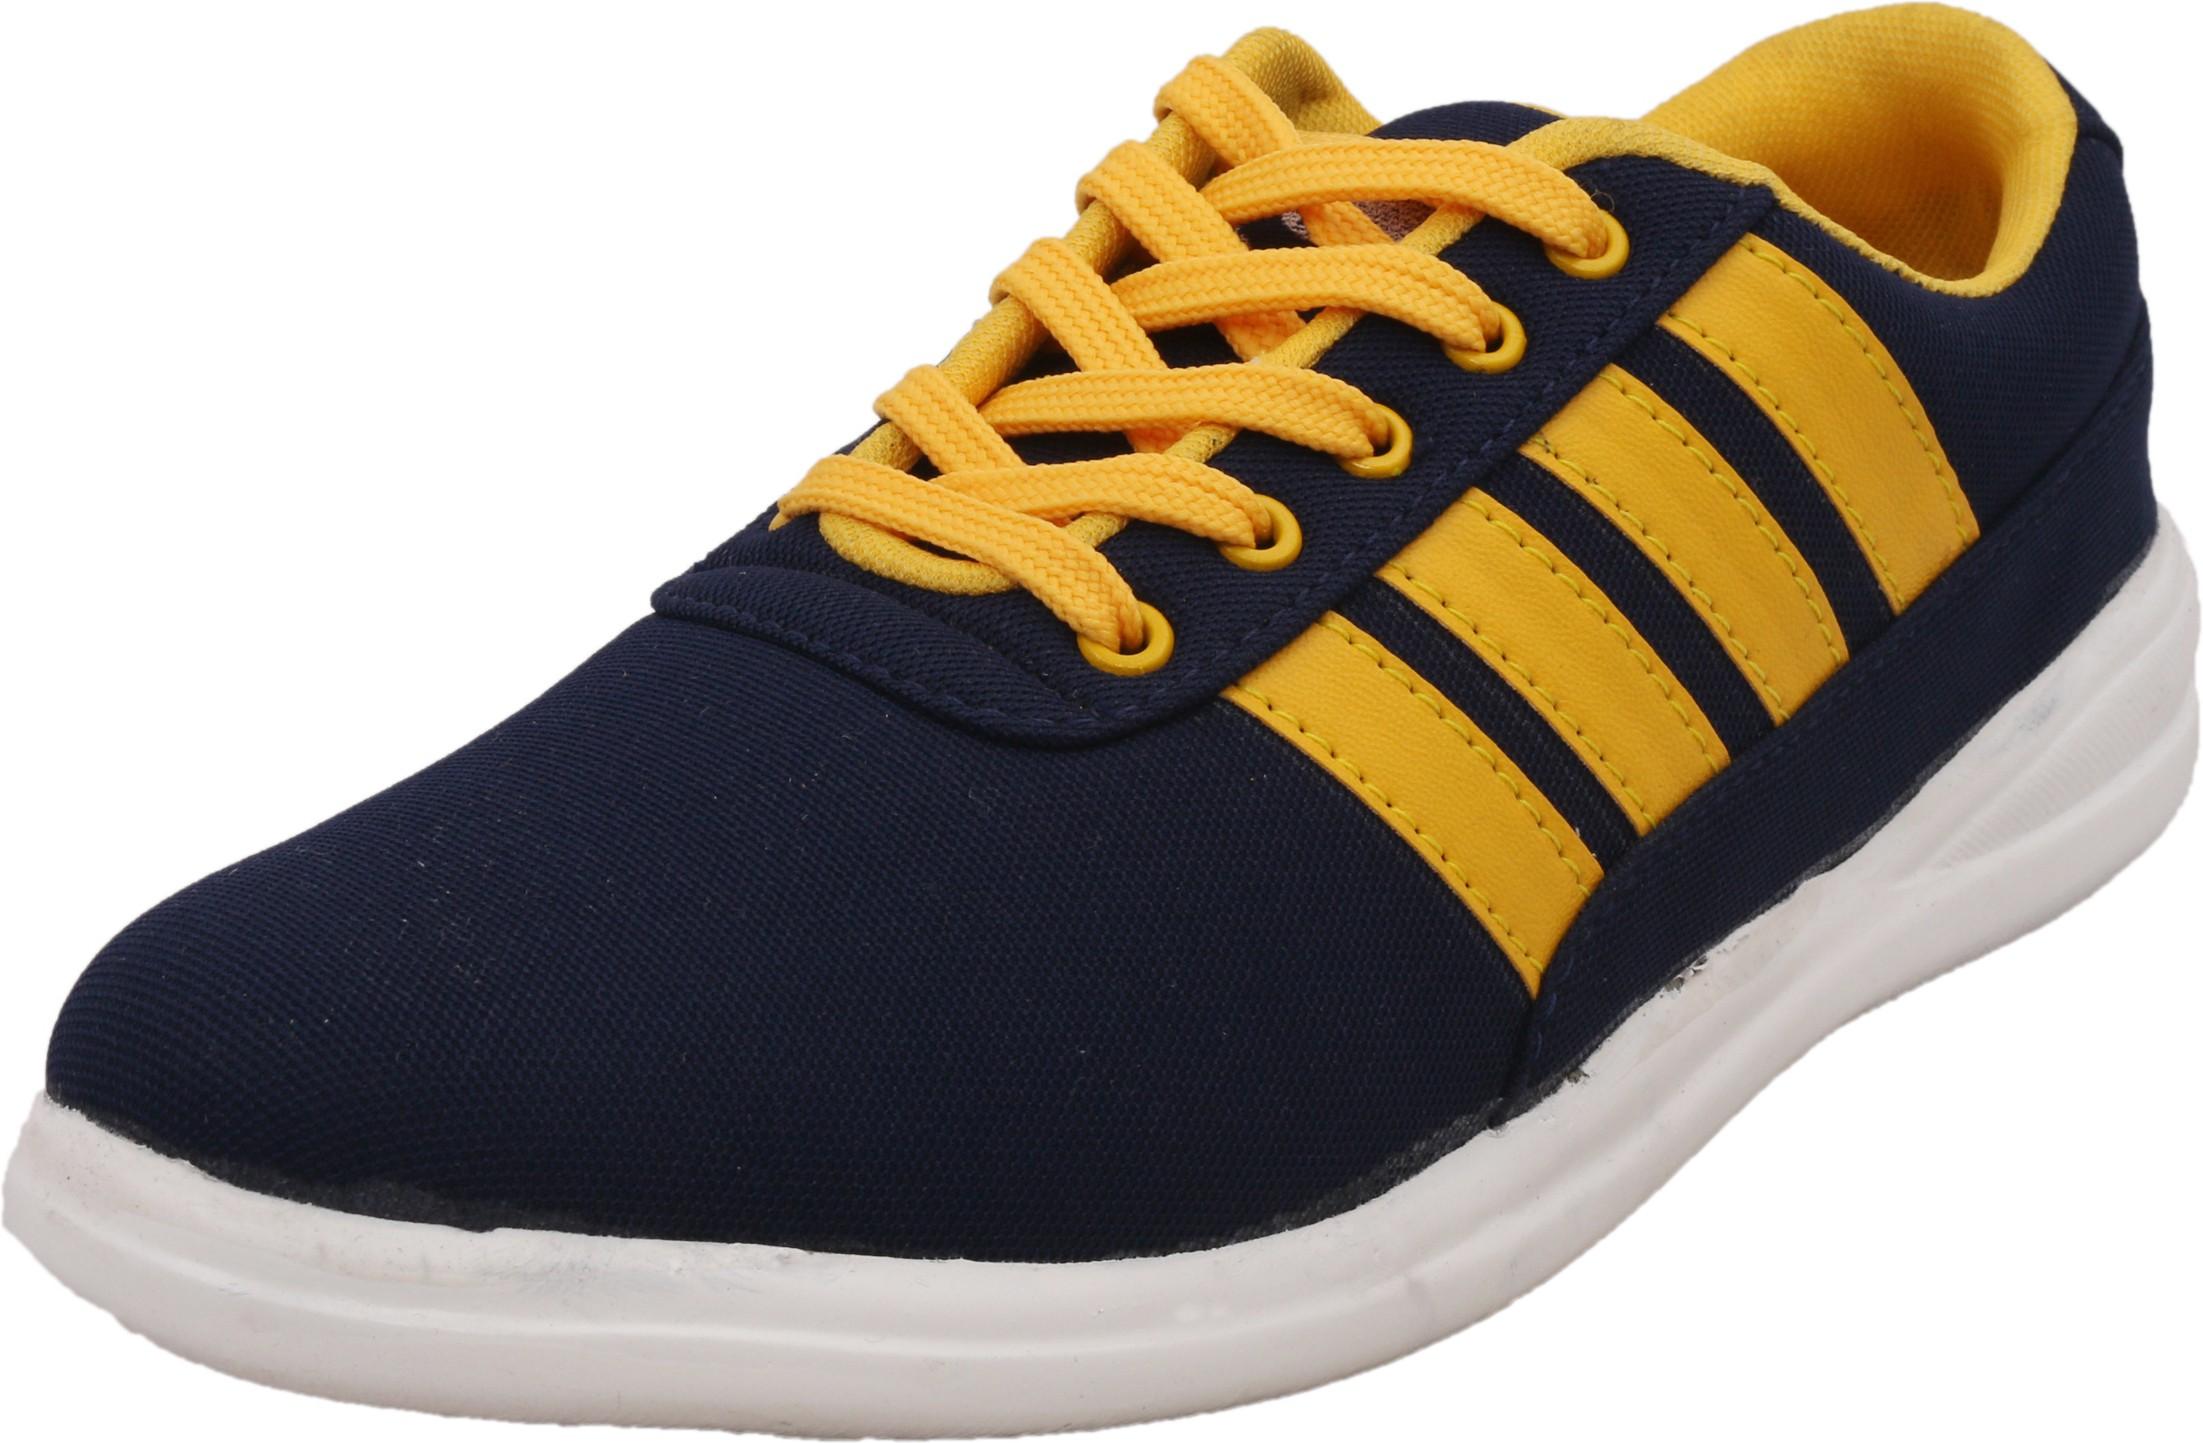 M Fasho SS15-1002 Canvas Shoes